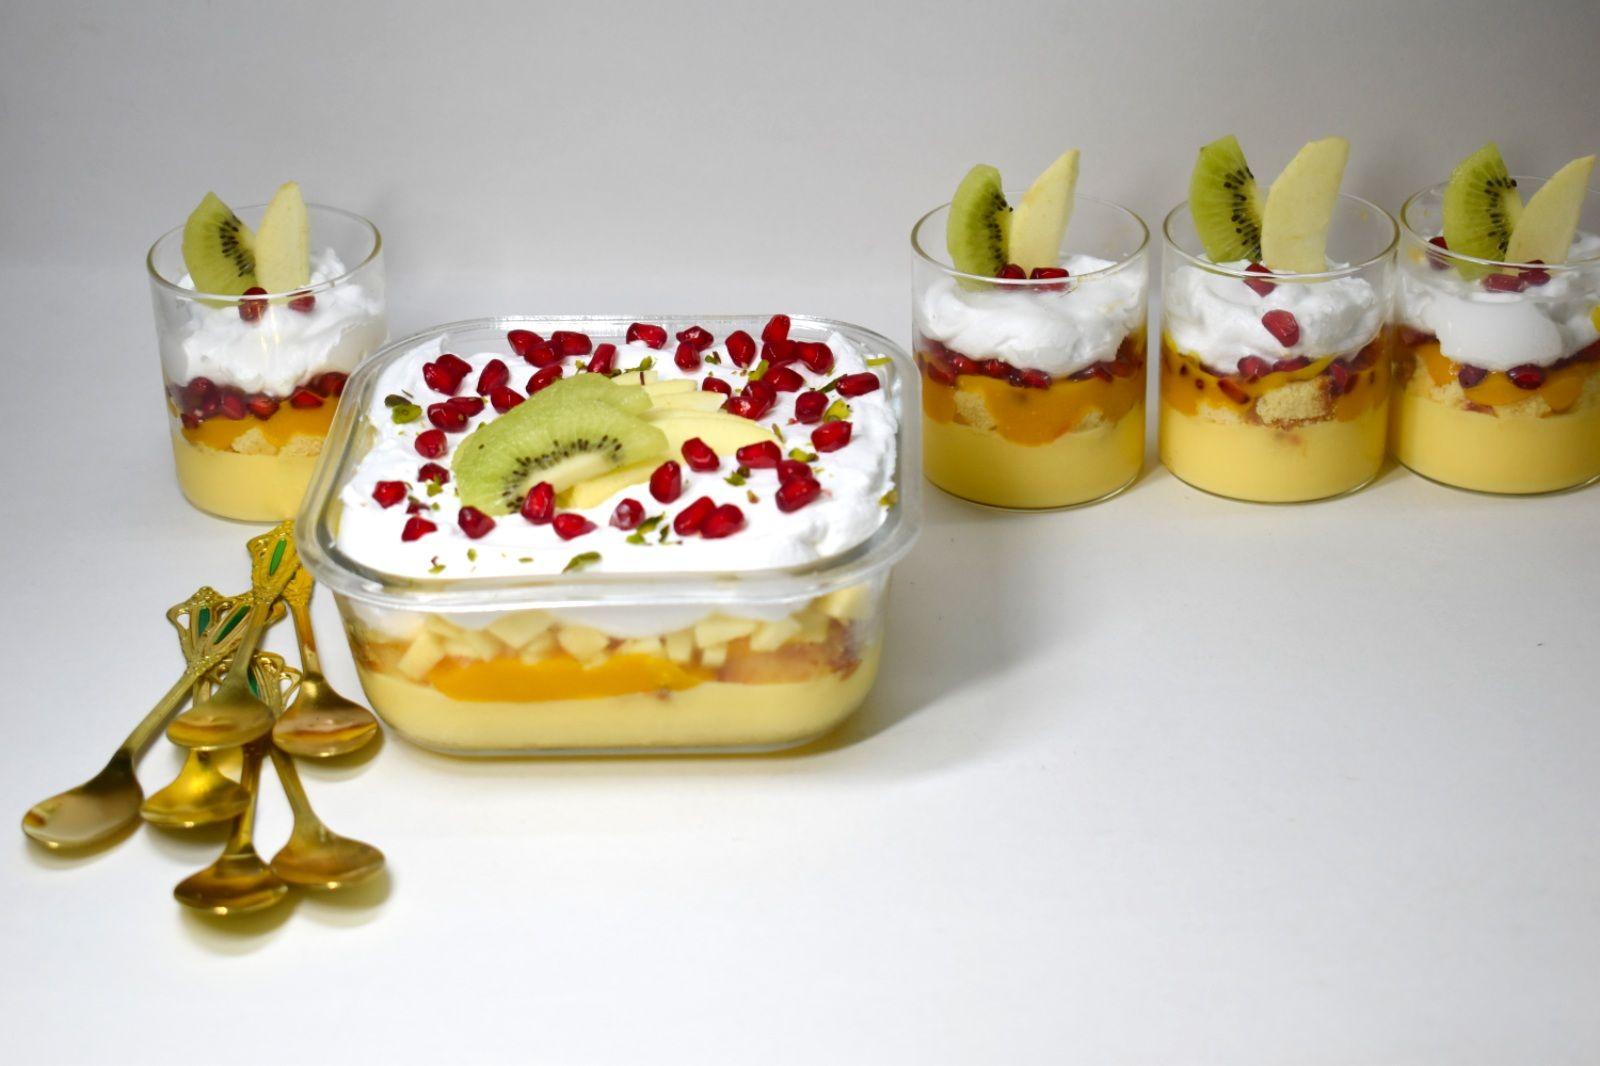 Custard Trifle Fruit Custard Trifle Easy Tasty Trifle Recipe Custard Recipes Trifle Recipe Fruit Trifle Recipes